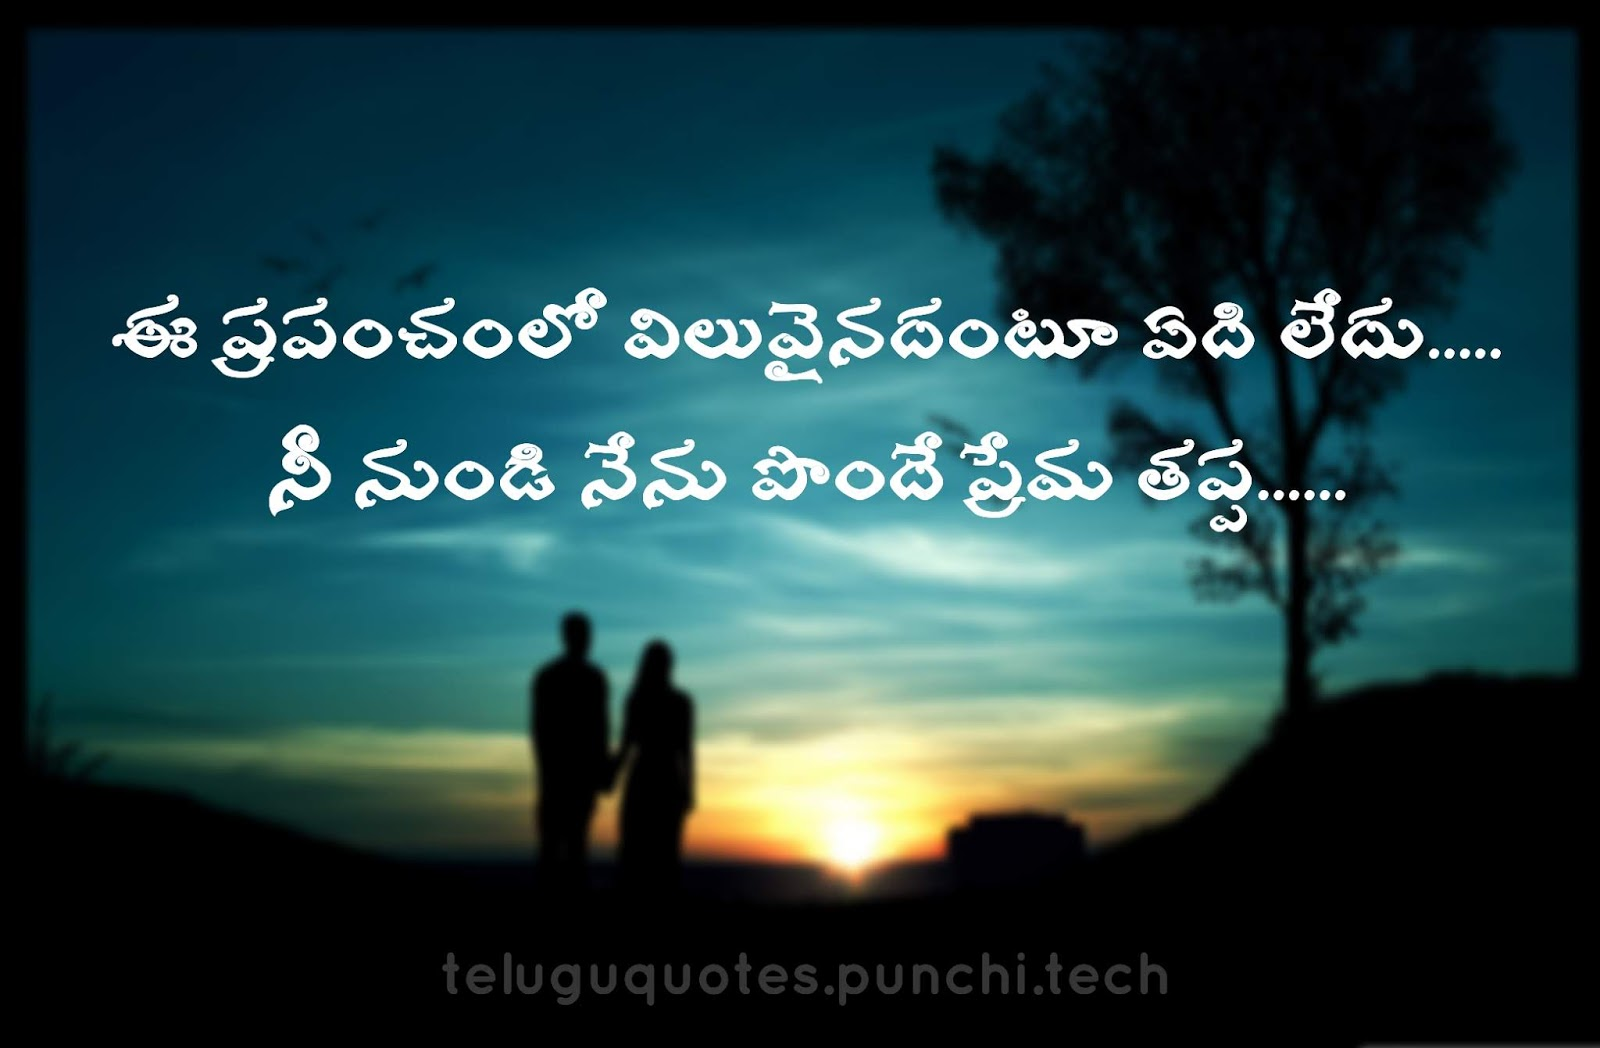 Love Quotes in Telugu || Telugu quotes about love